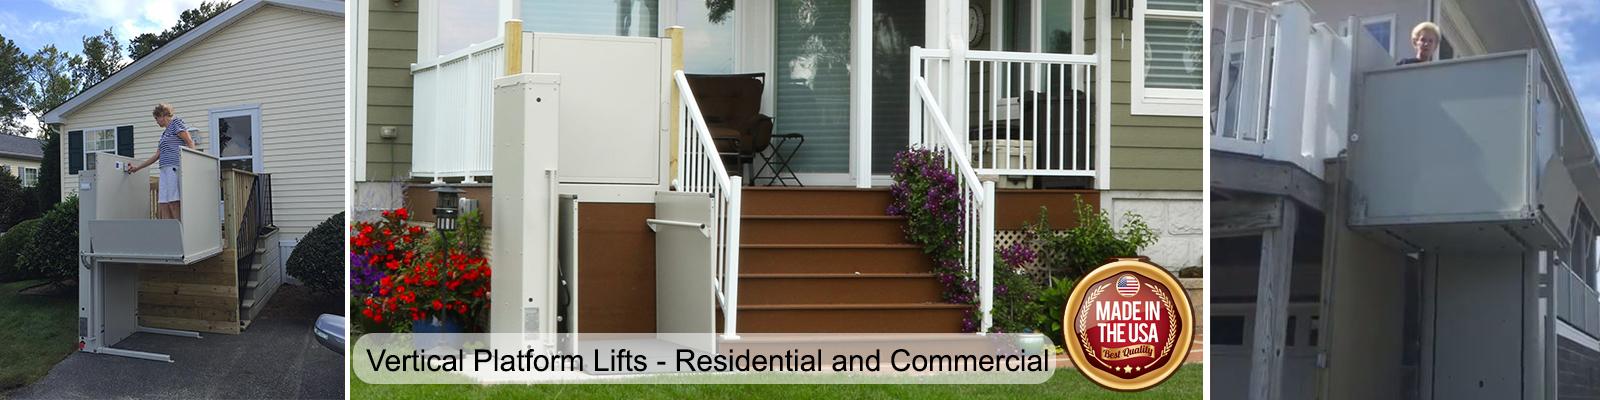 Bruno Vertical Platform Lifts Residential